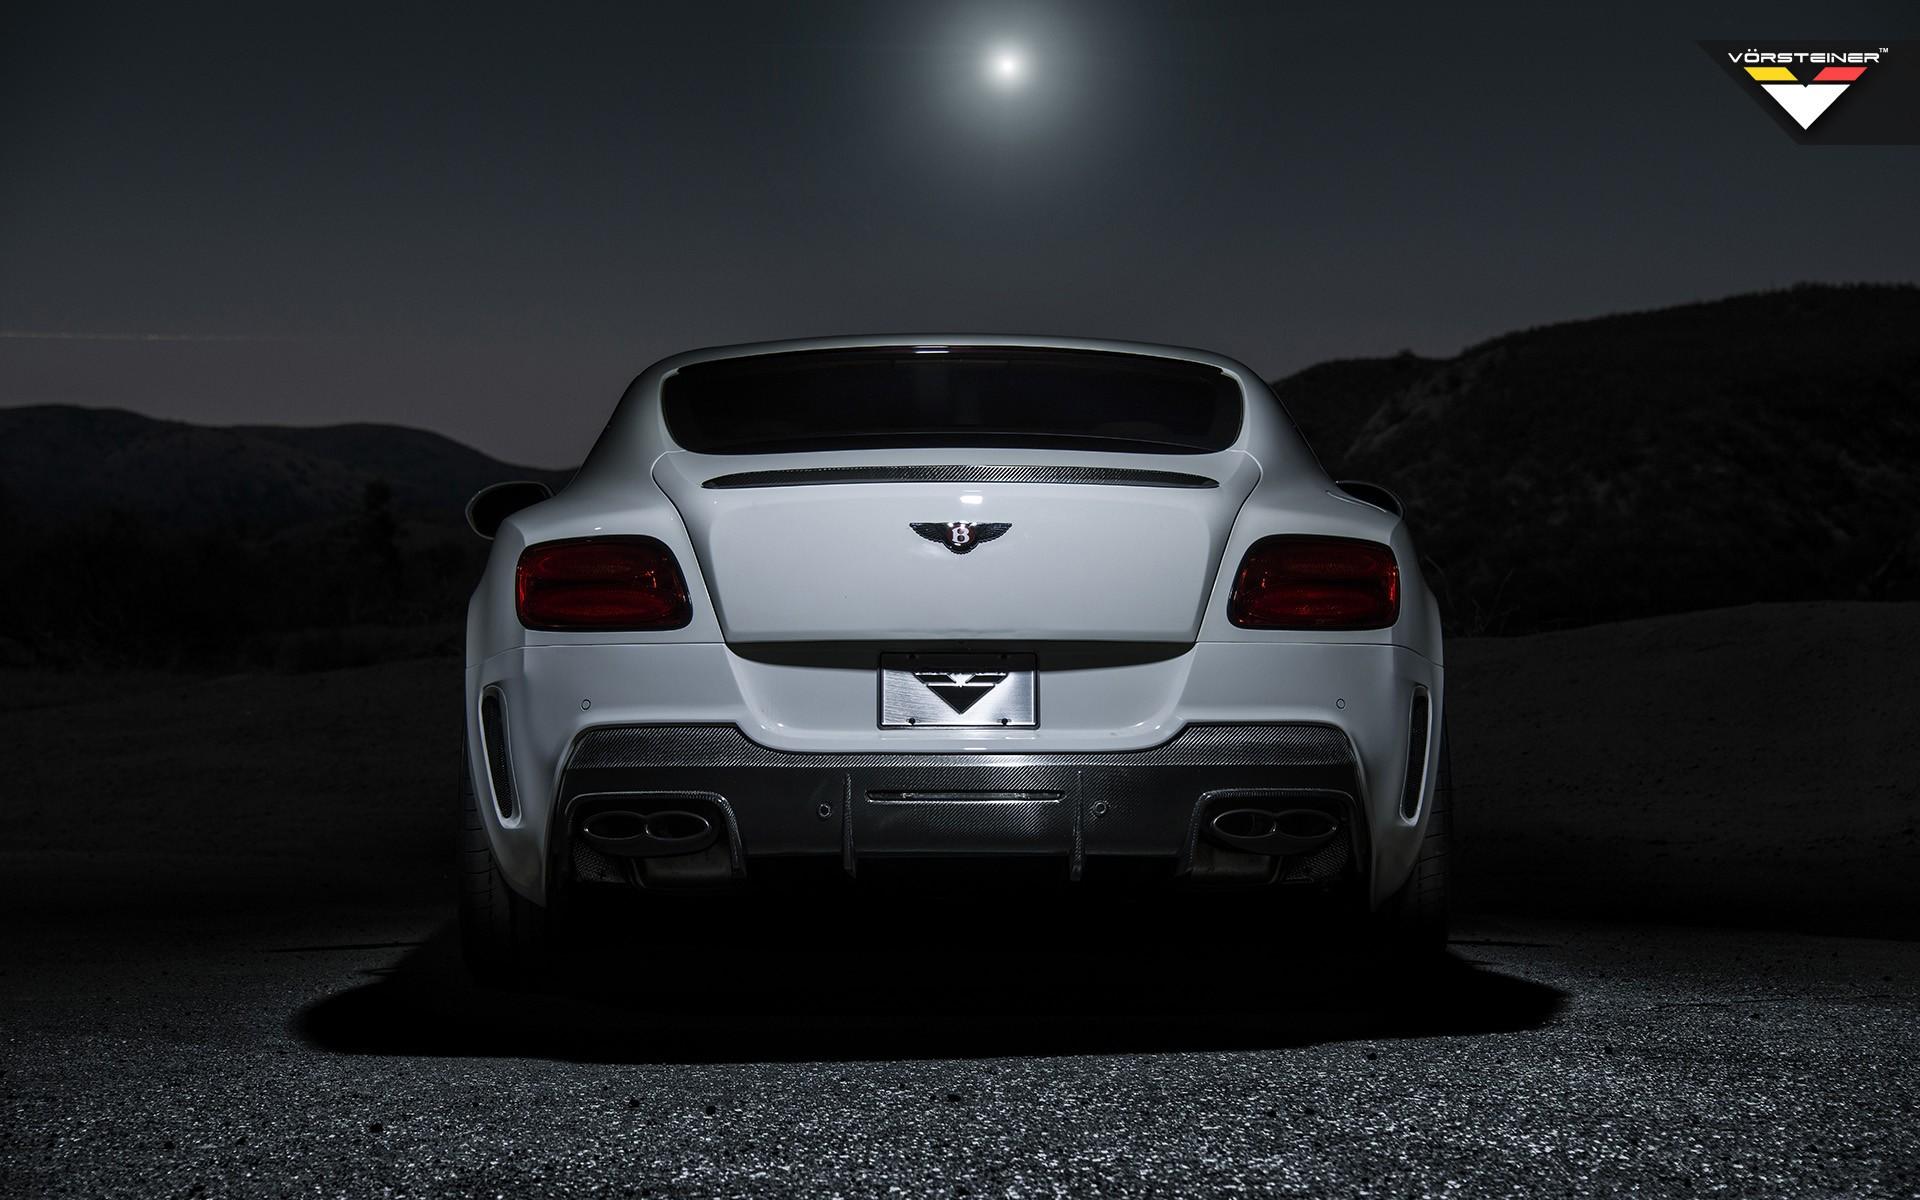 2013 Vorsteiner Bentley Continental Gt Br10 Rs 3 Wallpaper